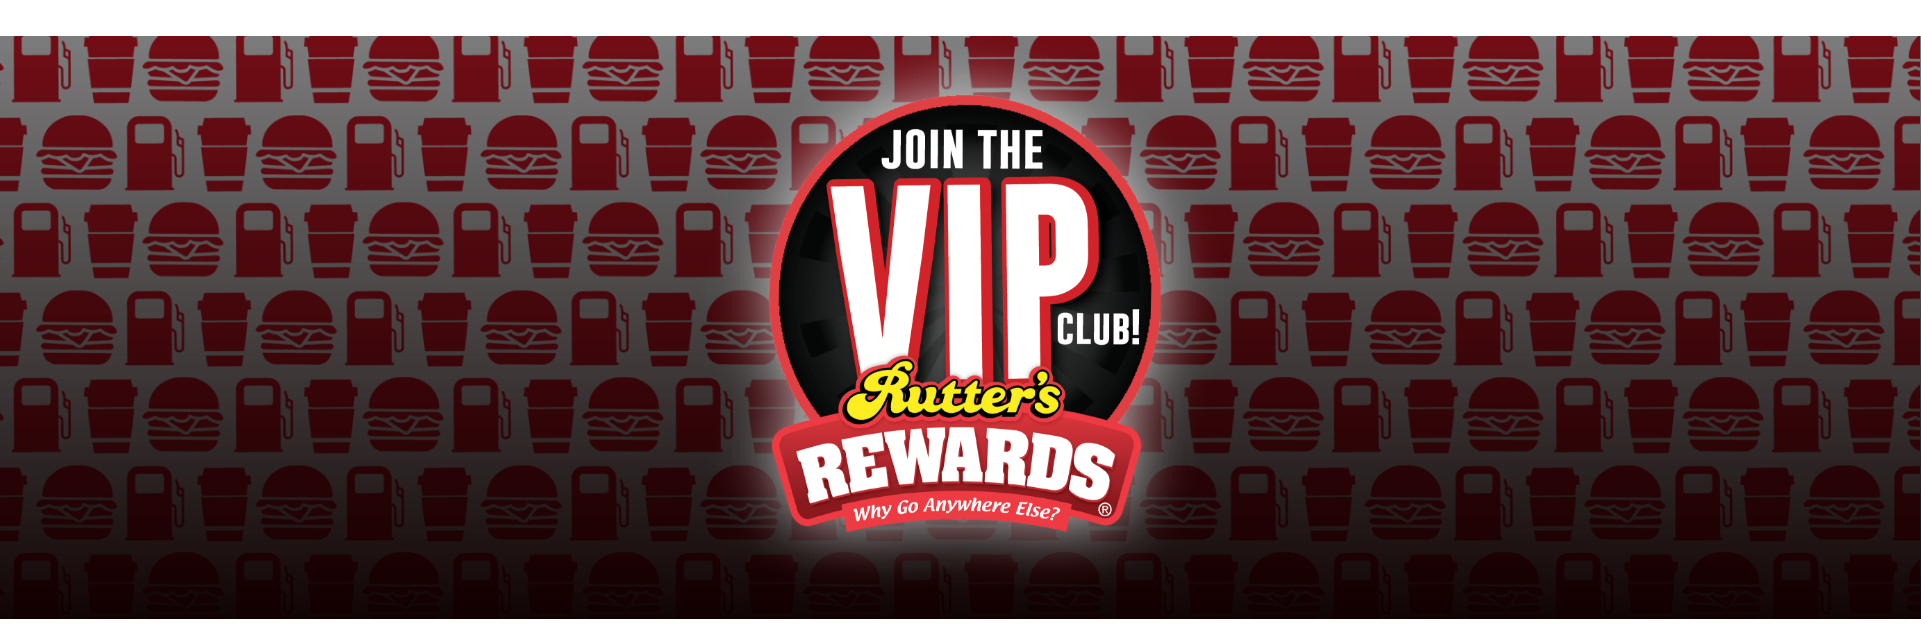 Rutter's VIP Club